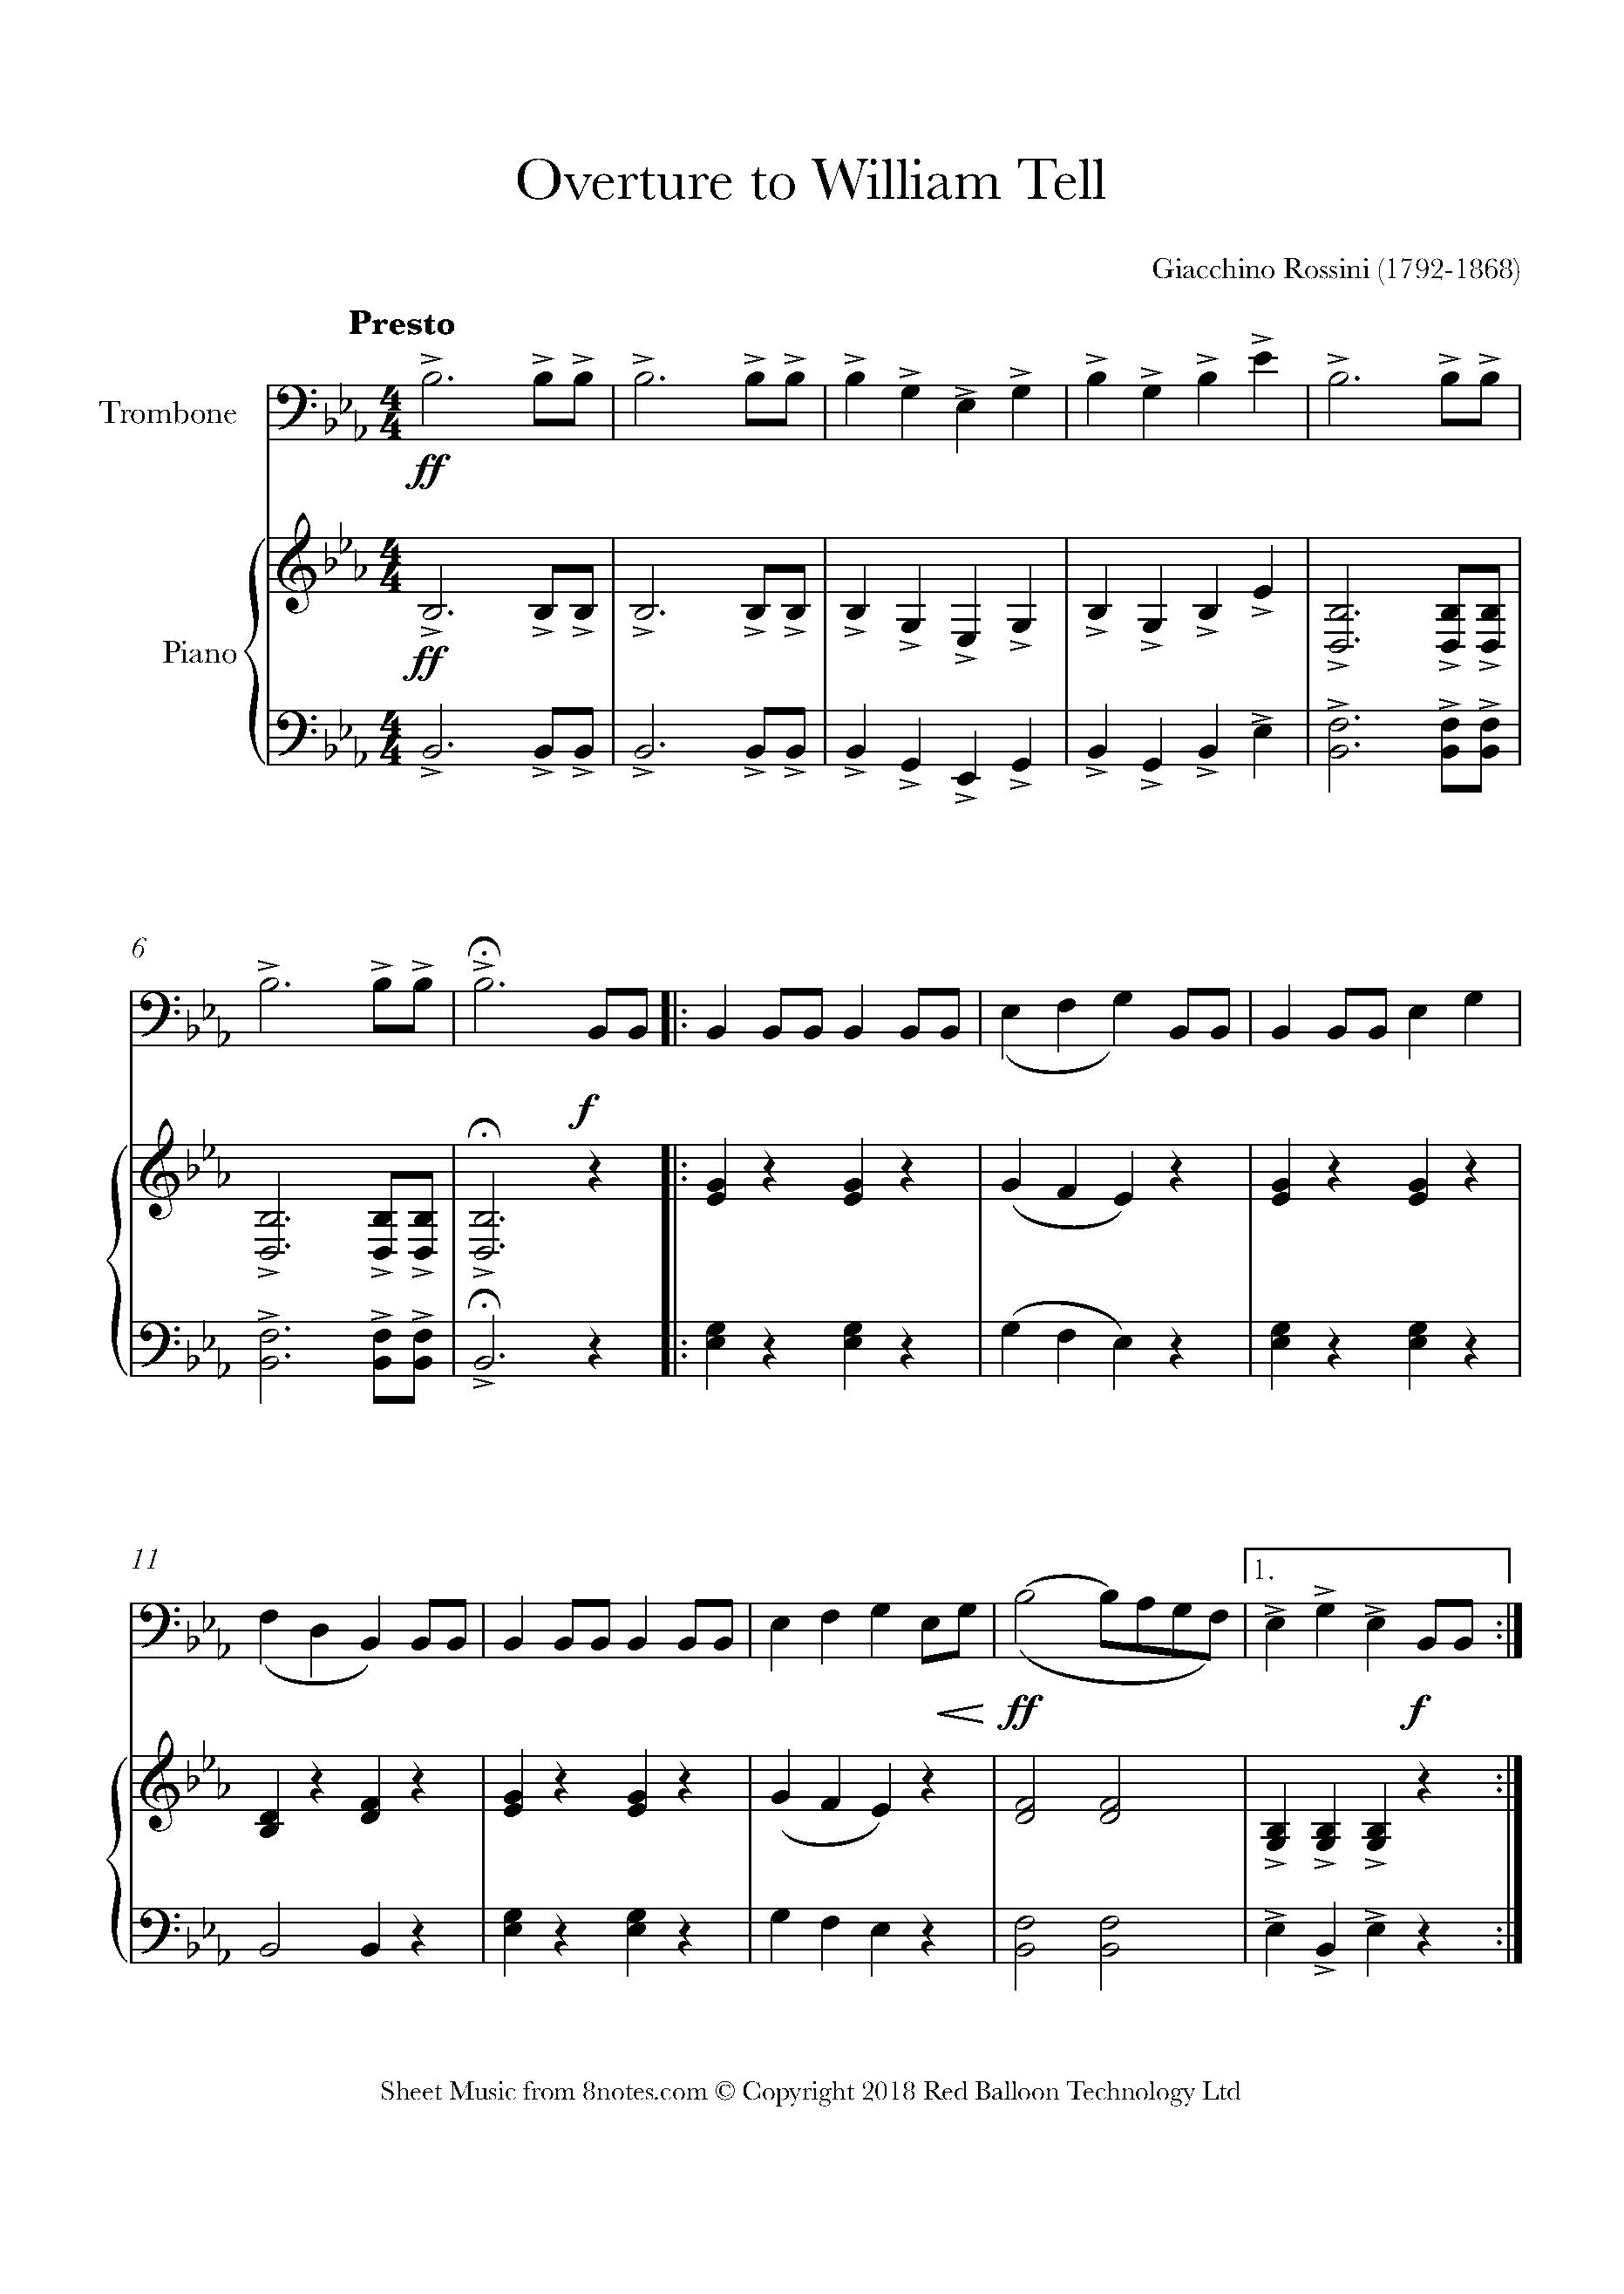 Trombone Christmas Sheet Music Free Printable – Festival Collections - Trombone Christmas Sheet Music Free Printable